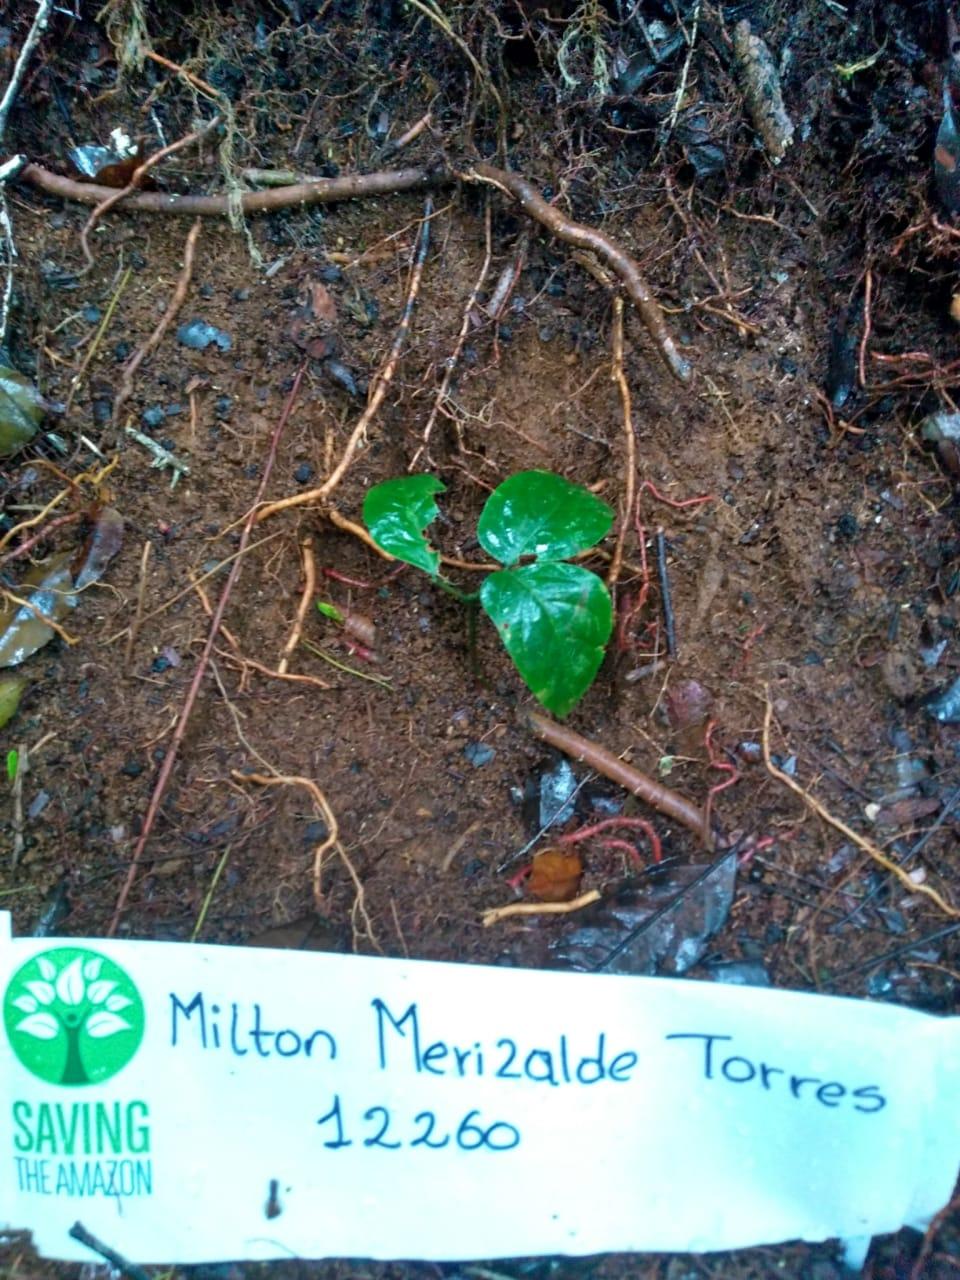 Milton Merizalde Torres